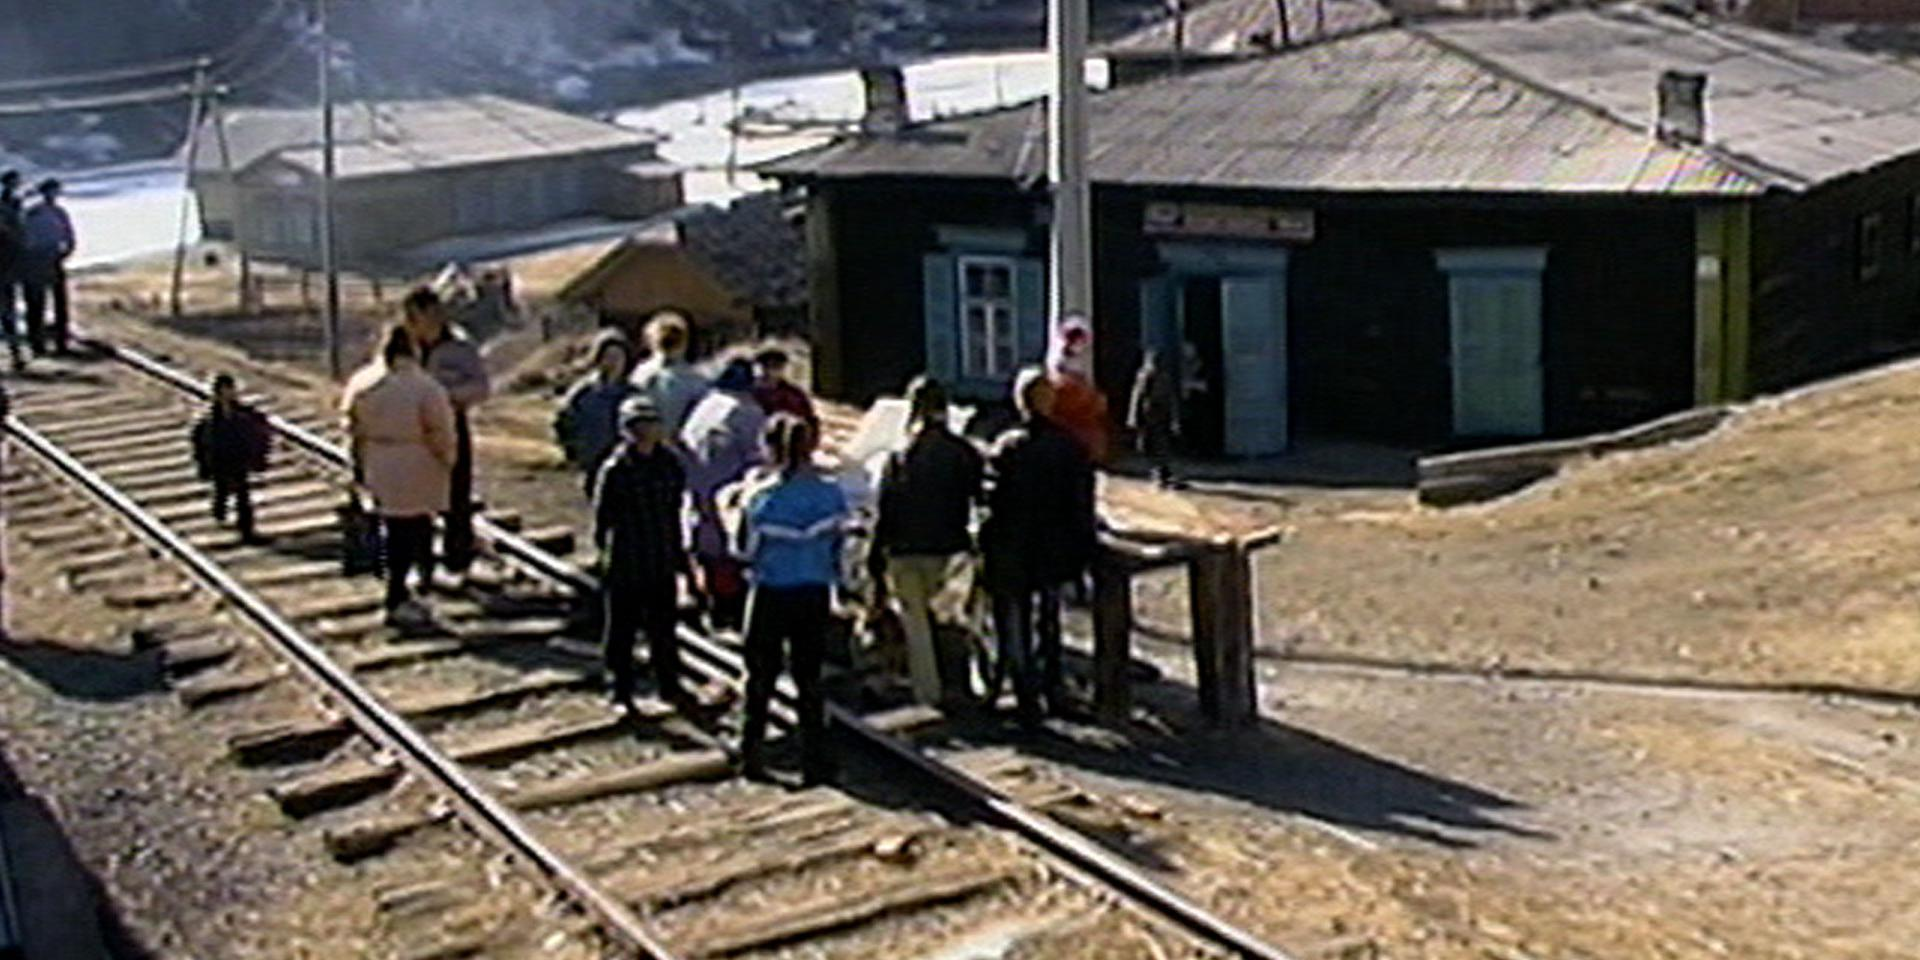 Modern Marvels: The Trans-Siberian Railroad